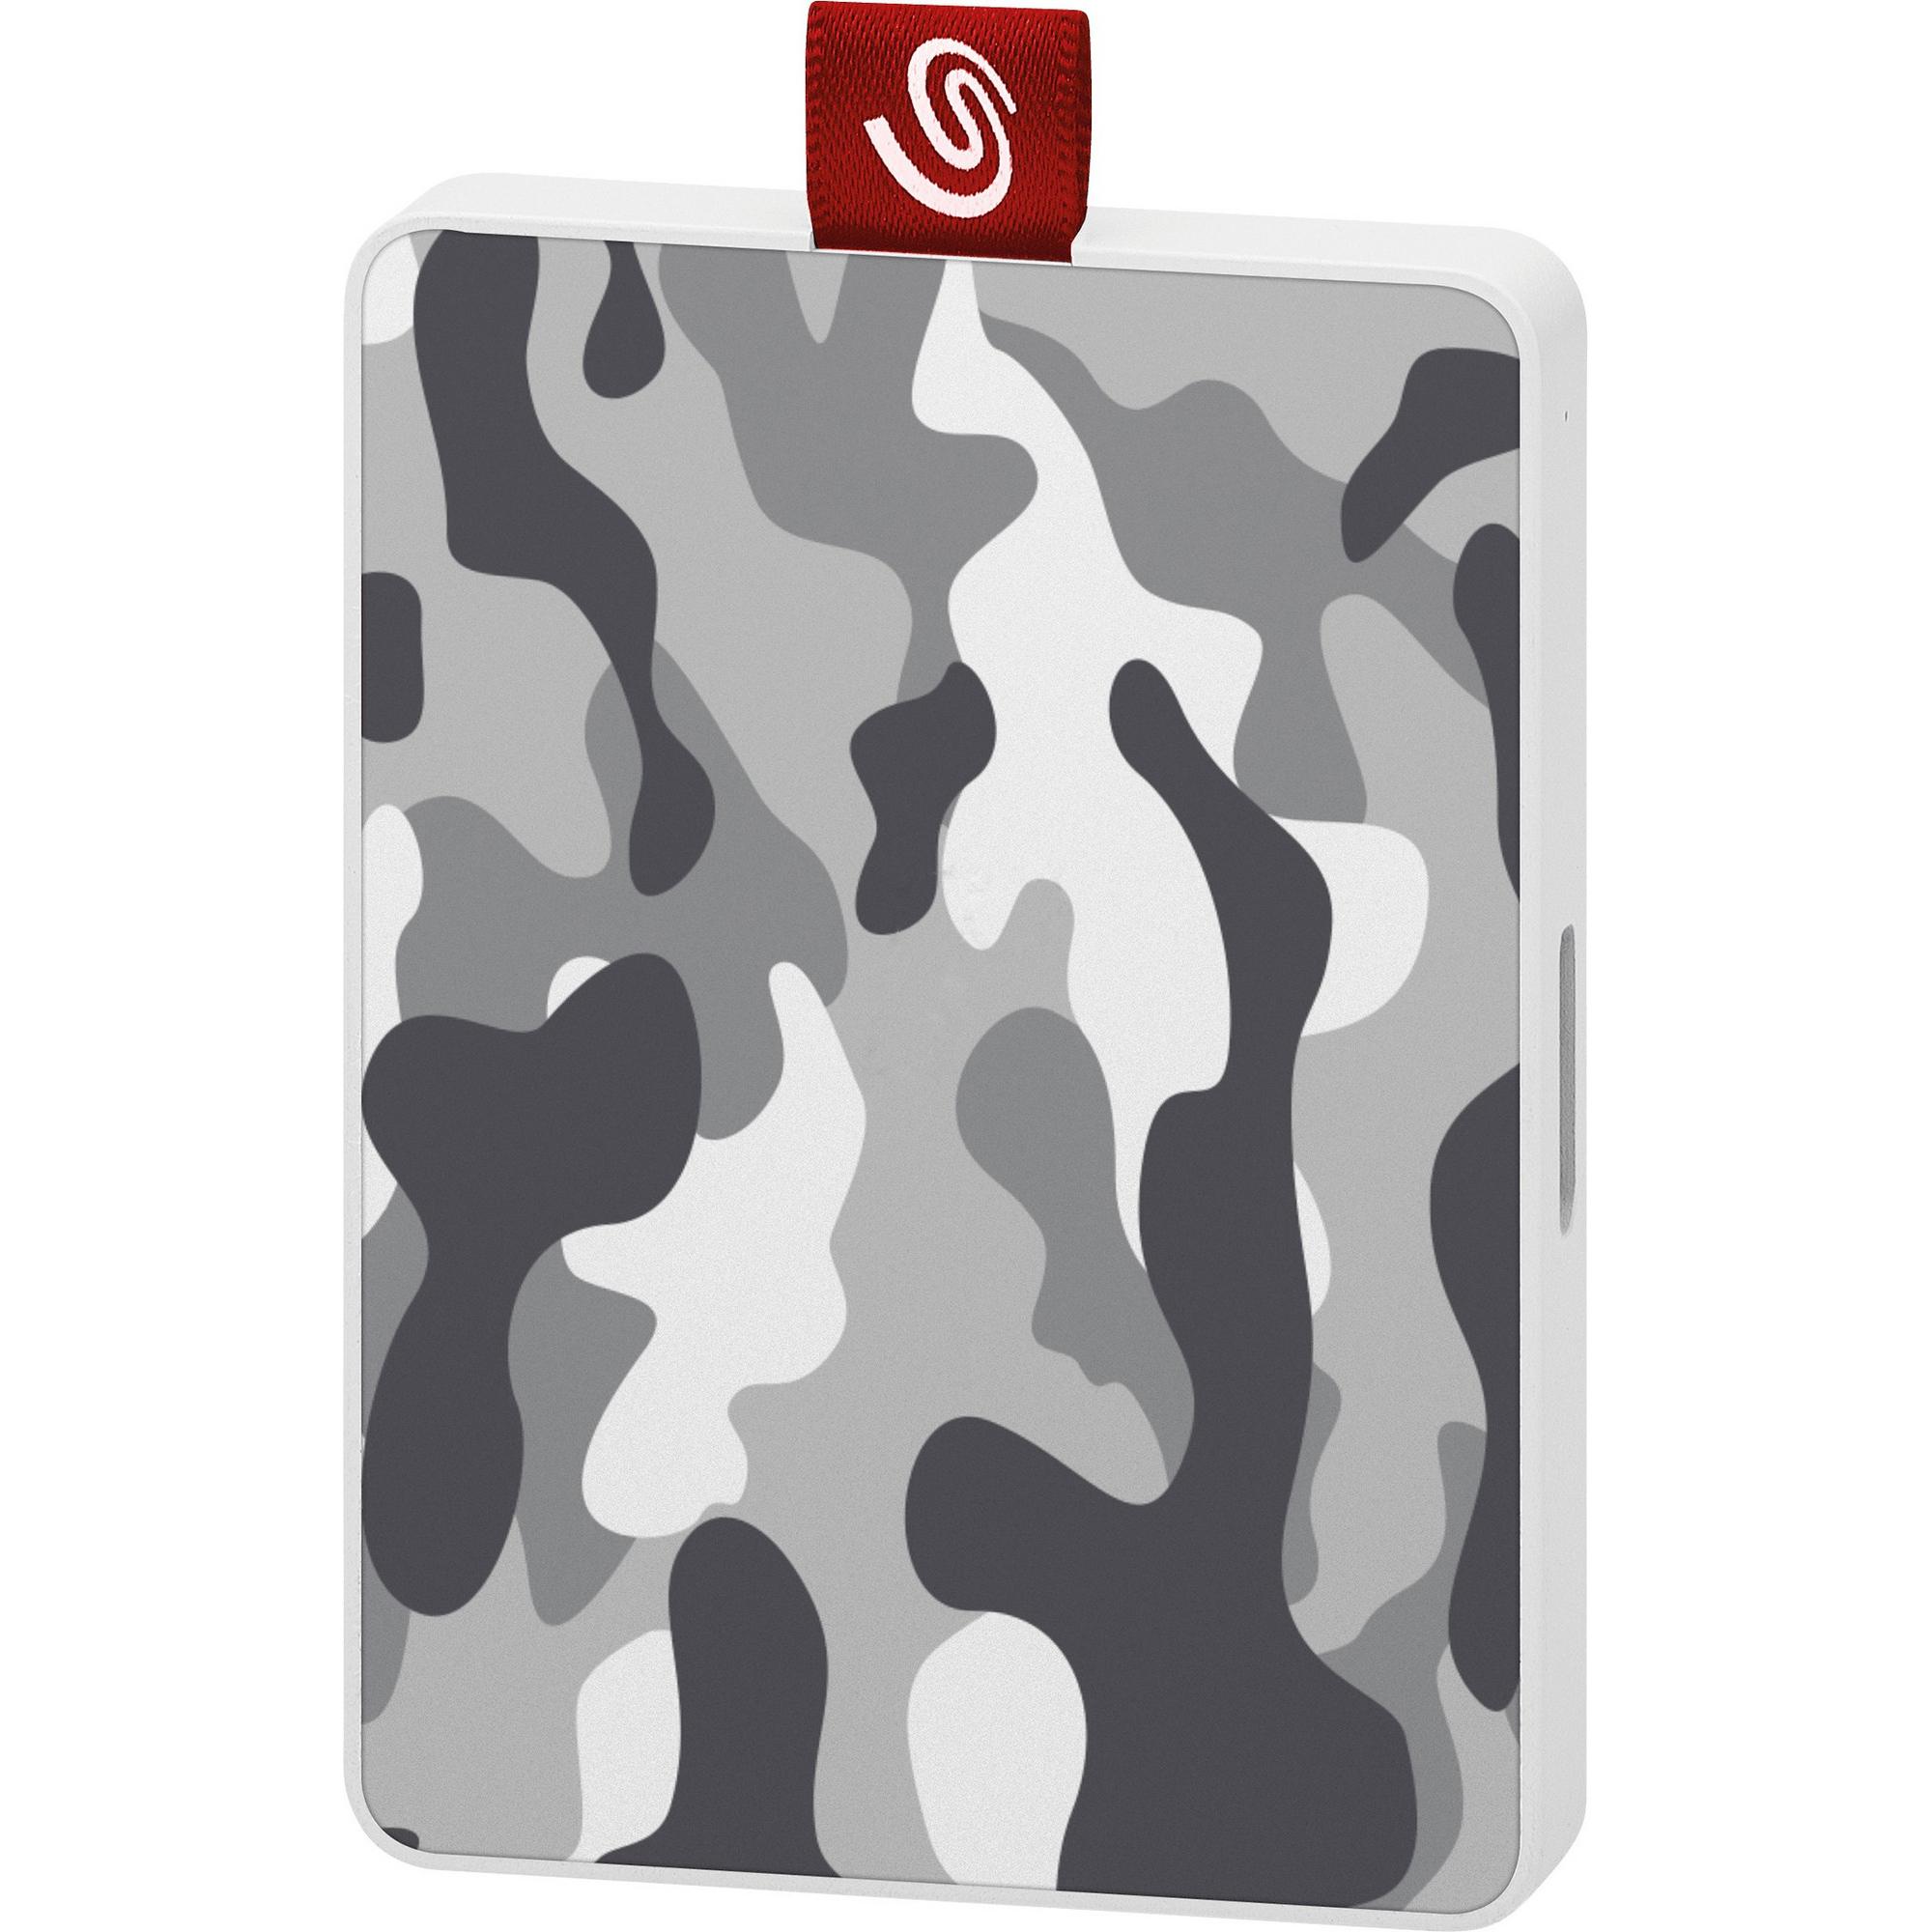 Жесткий диск Seagate One Touch SE 500GB STJE500404 Камуфляж серо-белый фото